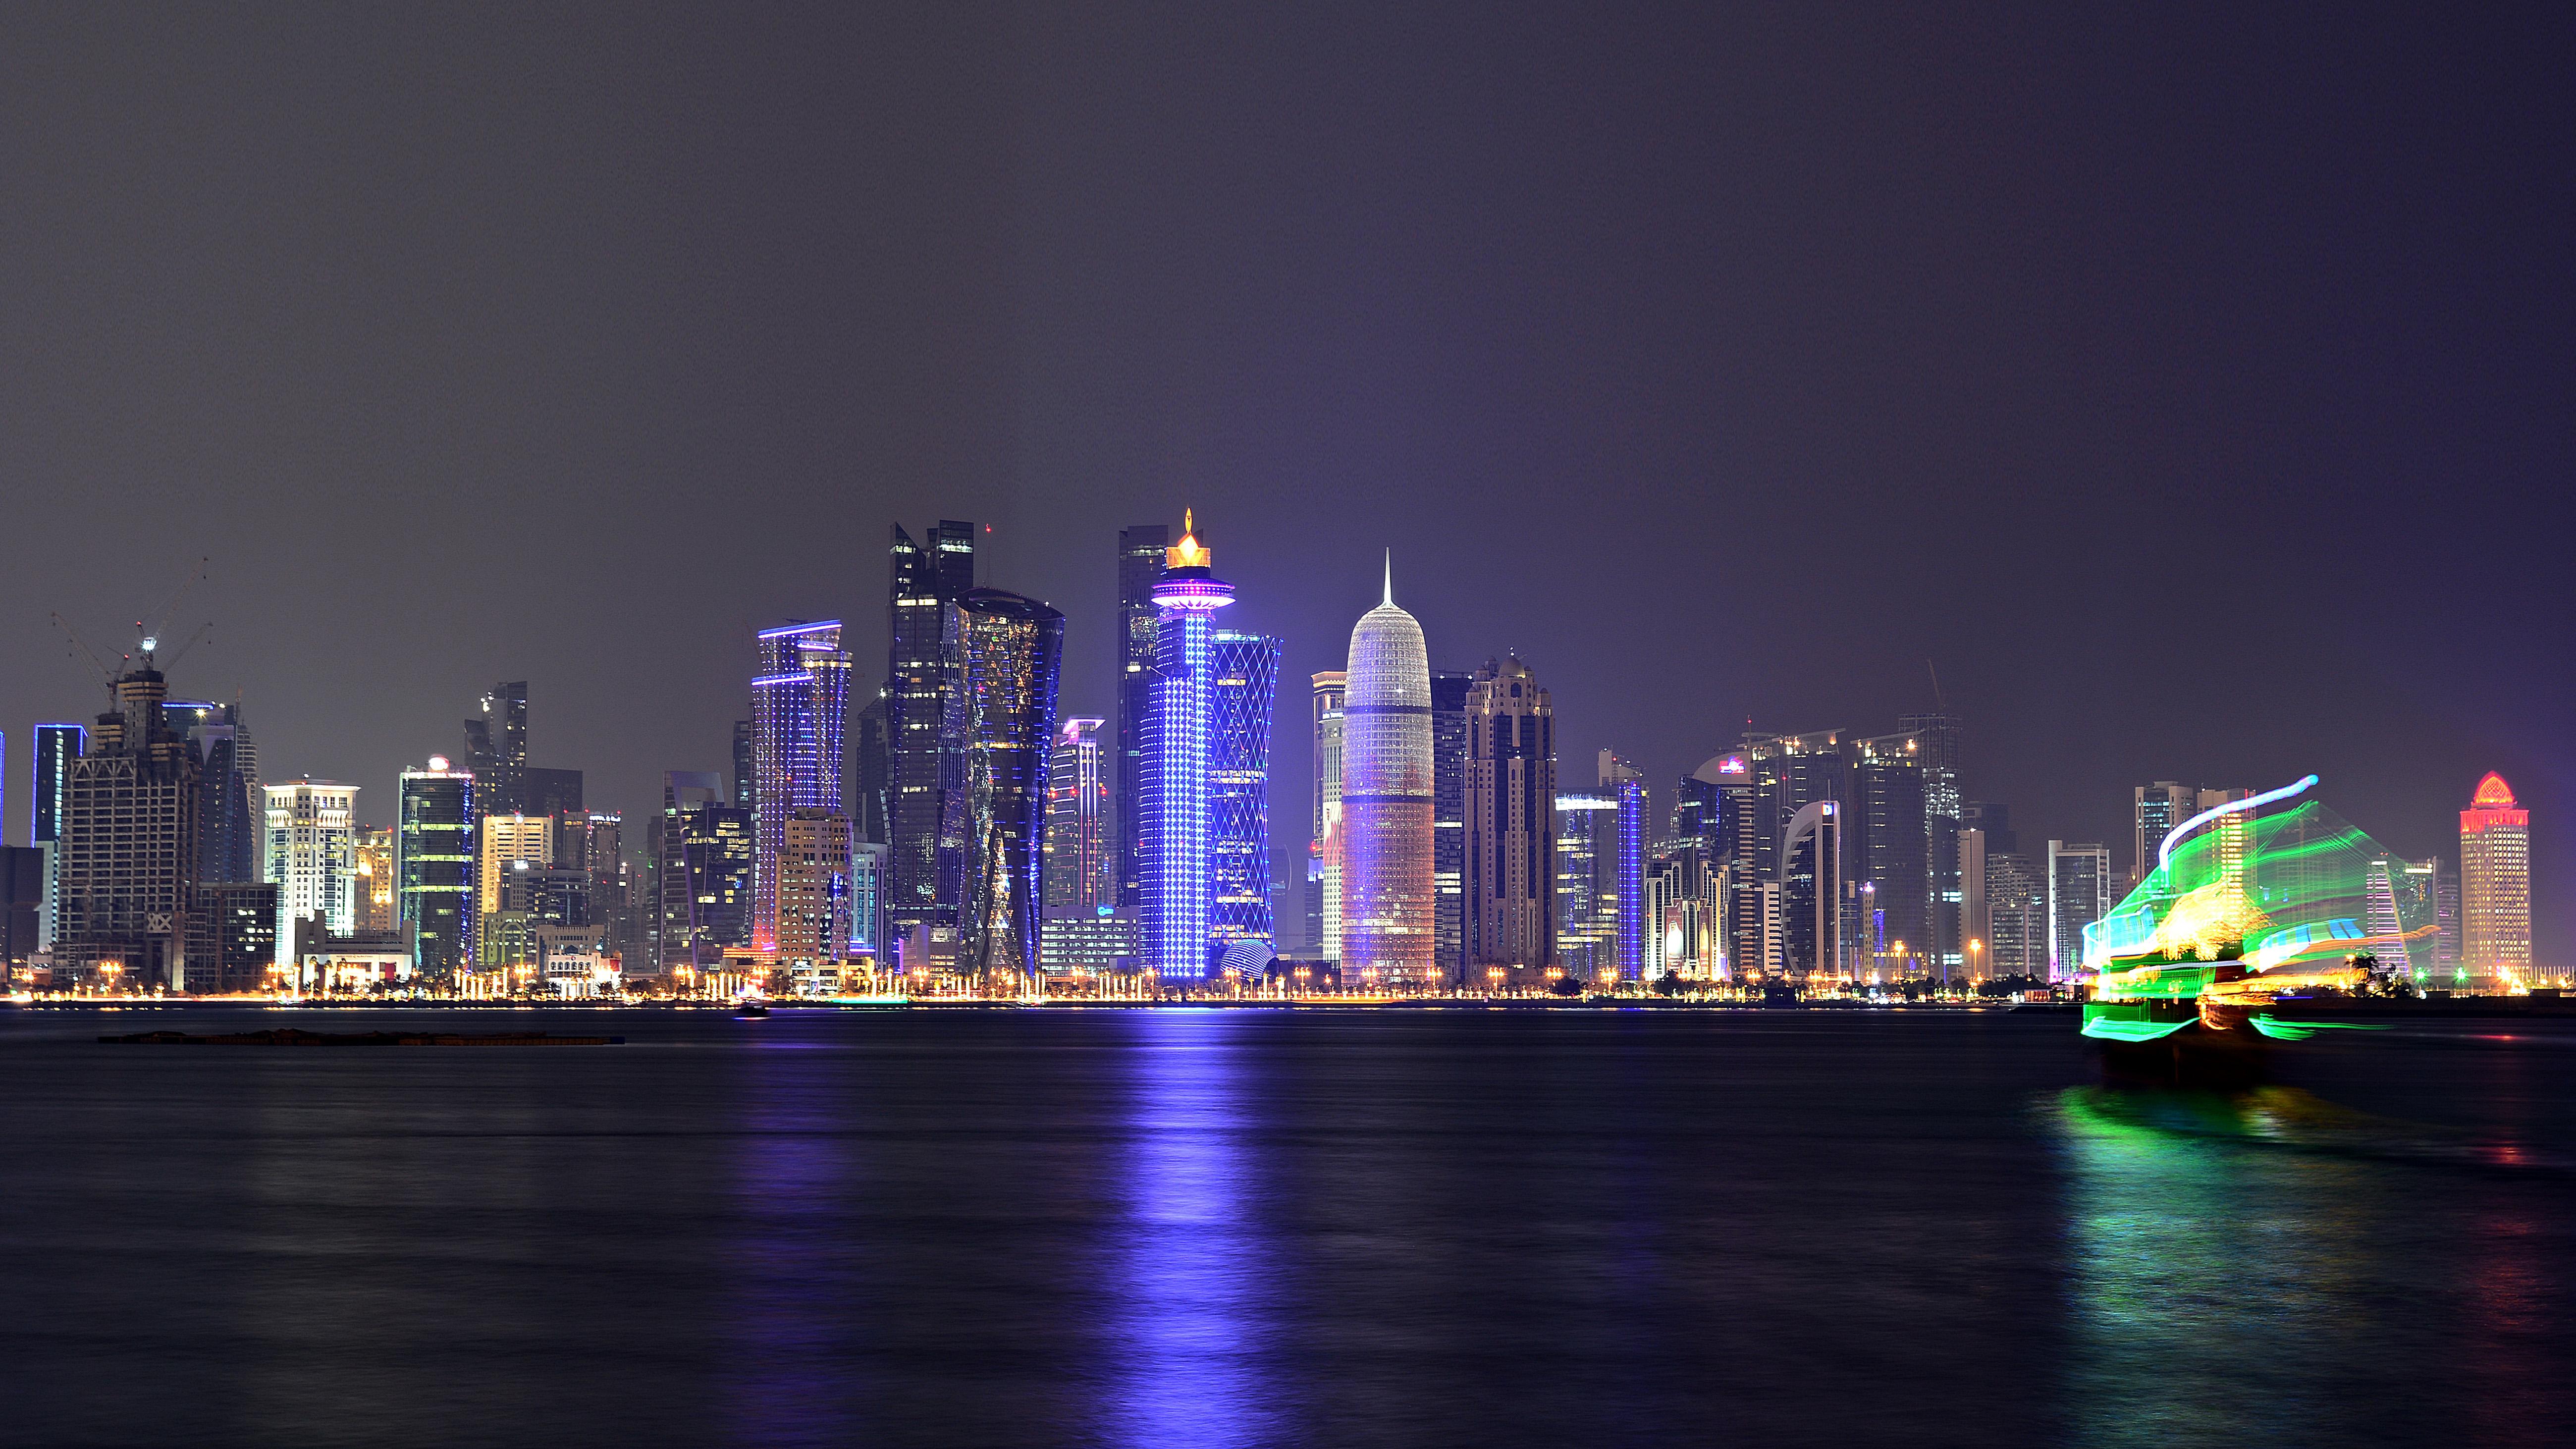 Qatar Dhows Towers Doha Bay Corniche Hd Desktop Wallpapers